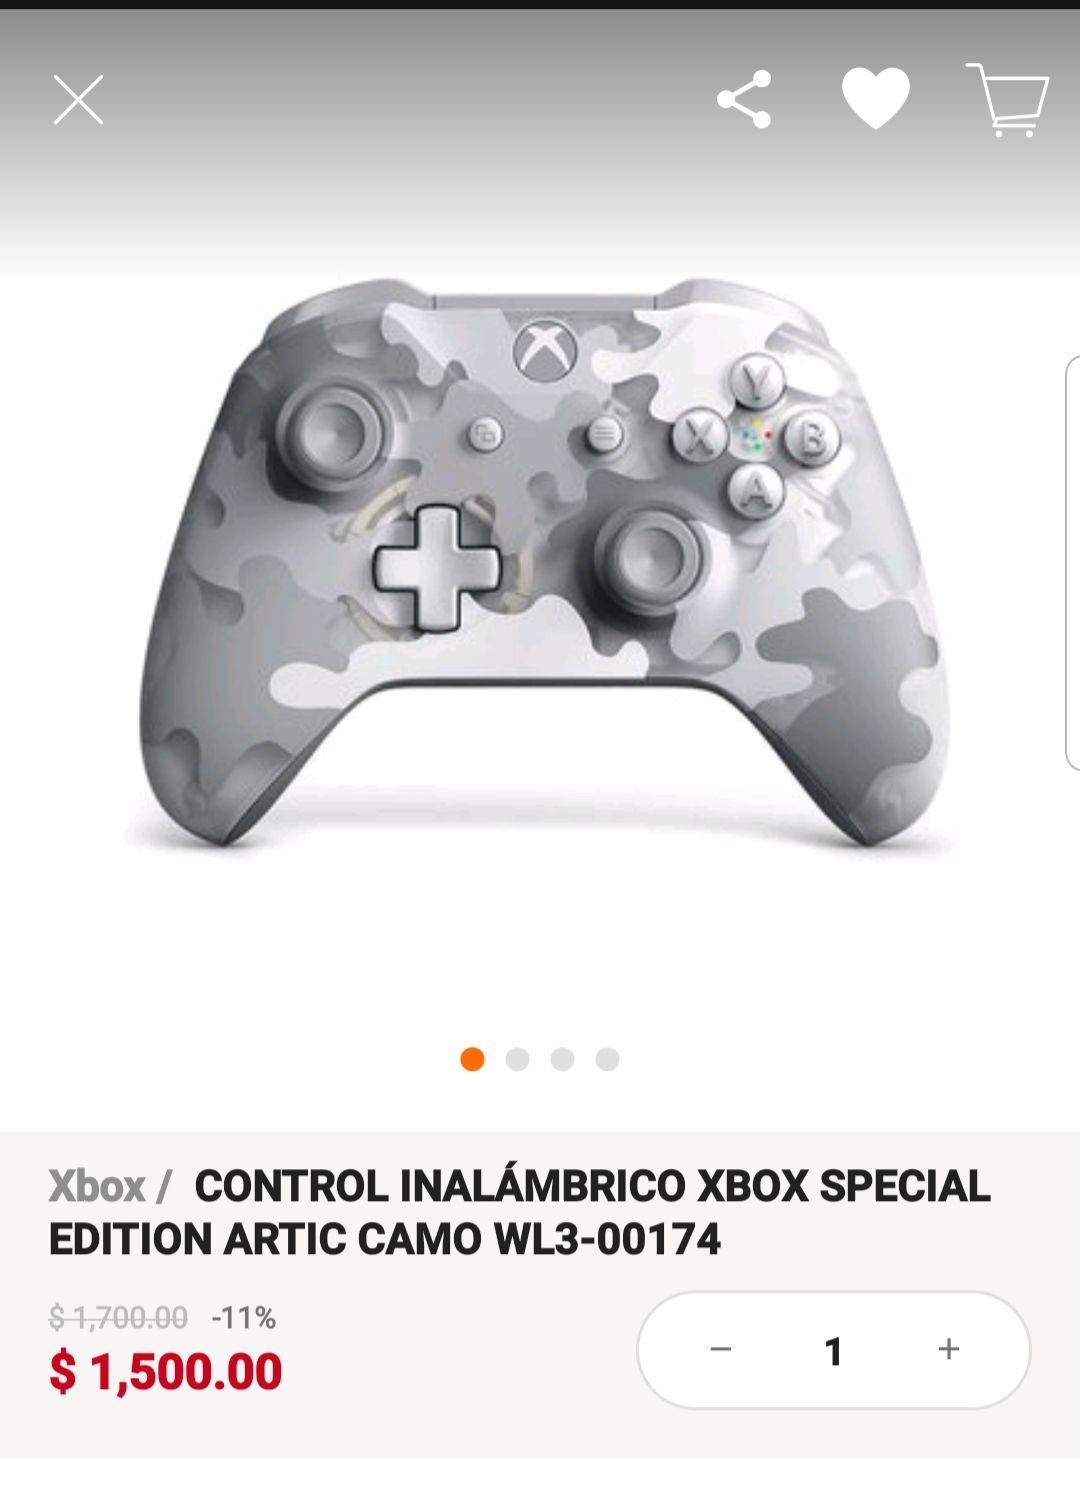 Linio: Control Xbox Artic Camo pagando con PayPal